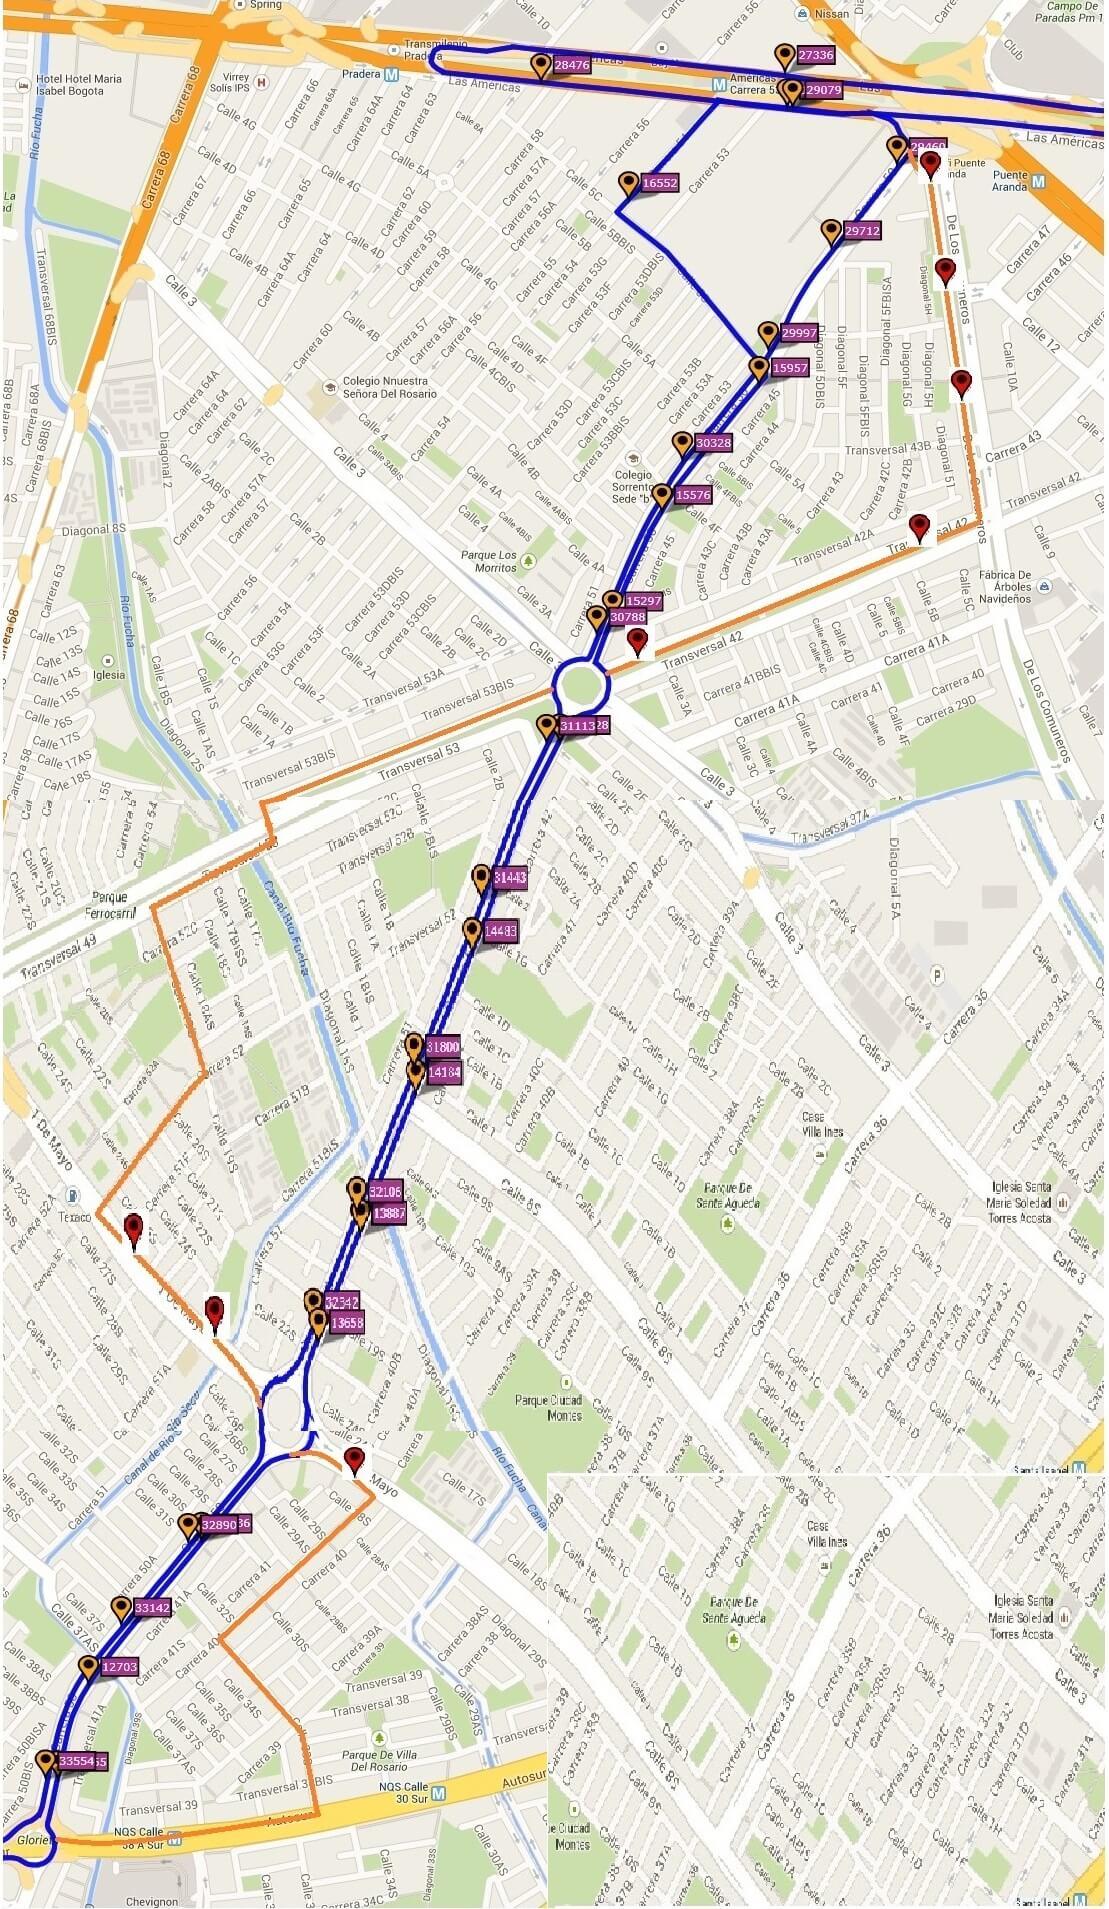 Ruta SITP: 579 El Recreo ↔ Centro Internacional [Urbana] 9